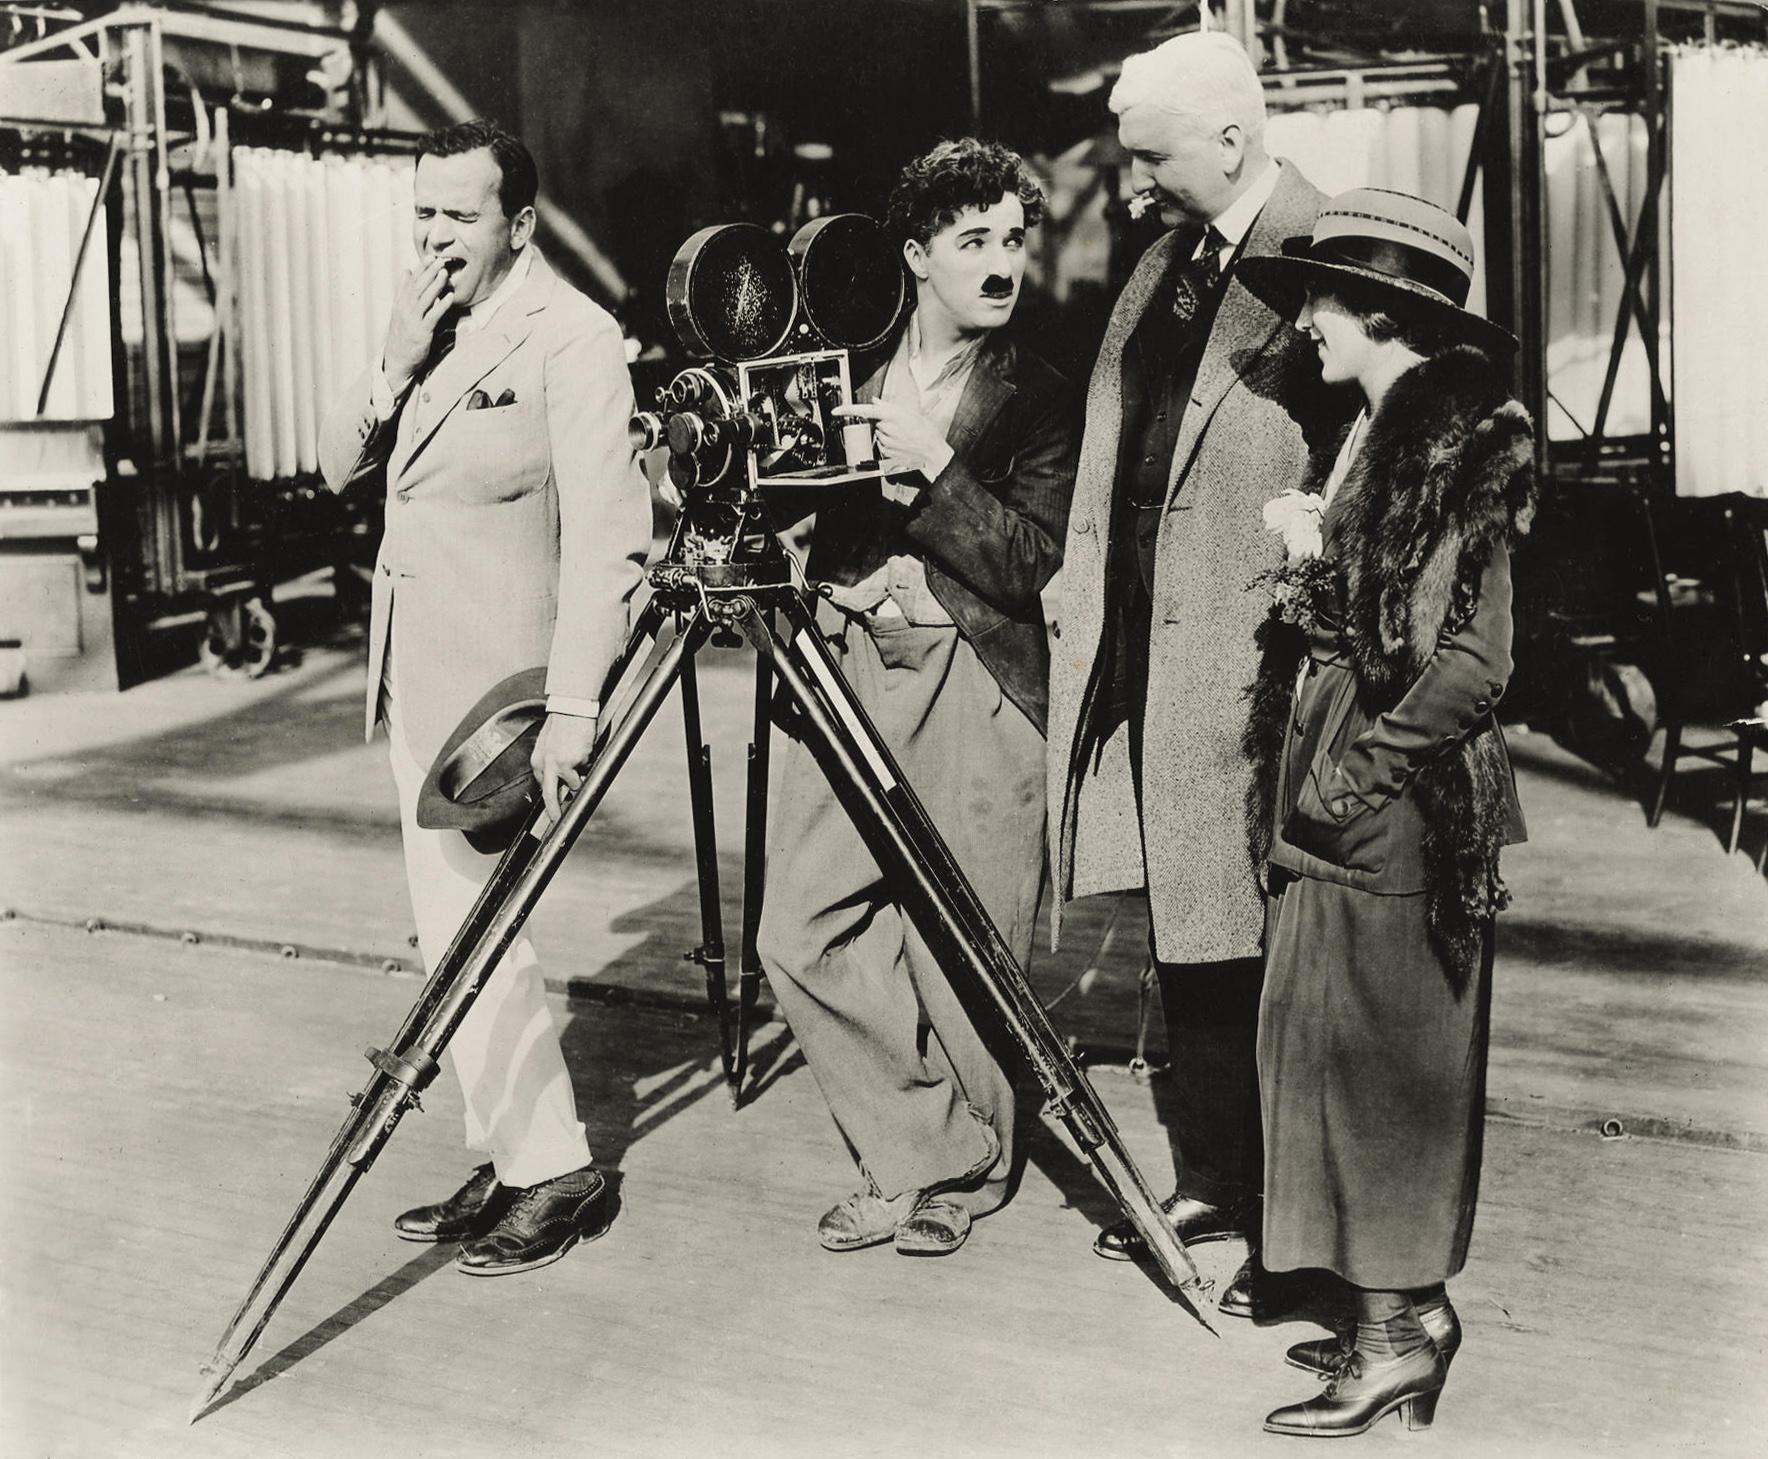 (L to R) Douglas Fairbanks, Sr.,Charlie Chaplin,Thomas Edison,Mary Pickford